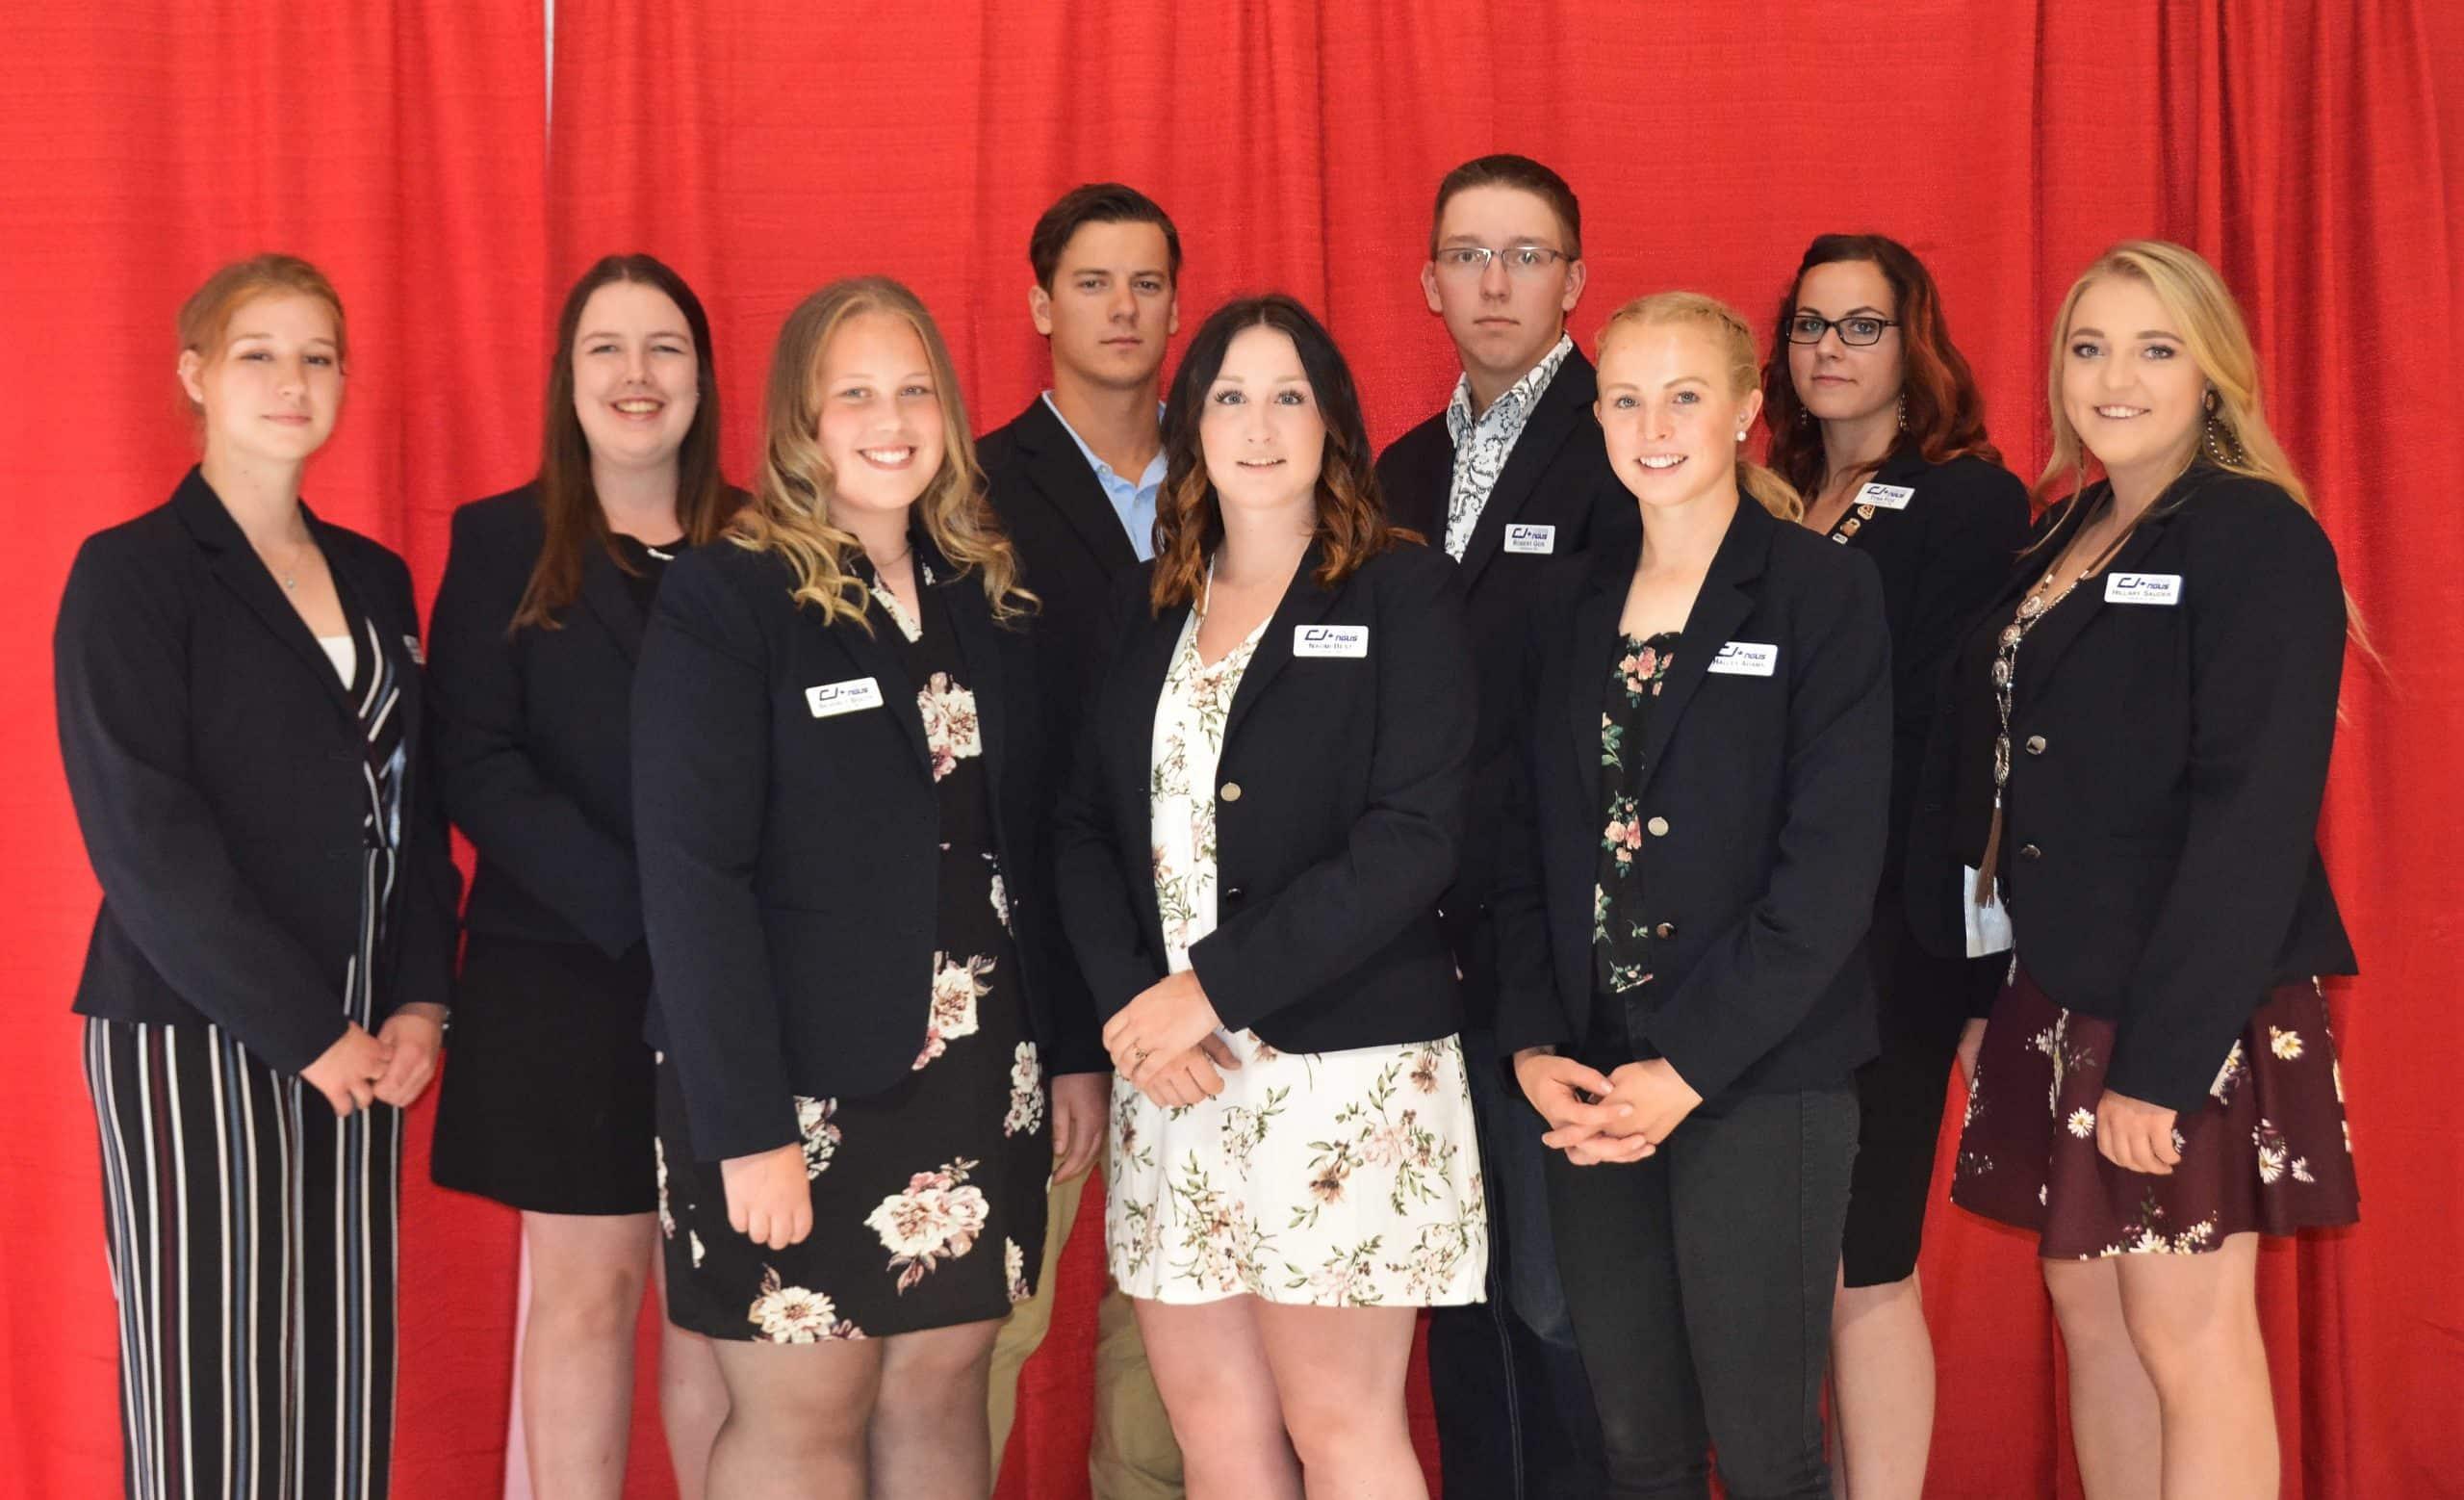 CJA 2019 Board of Directors, left to right: Sarah MacDonald, Charlene Elliott, Beverly Booth, Mark Sample, Naomi Best, Robert Geis, Halley Adams, Tyra Fox, Hillary Sauder